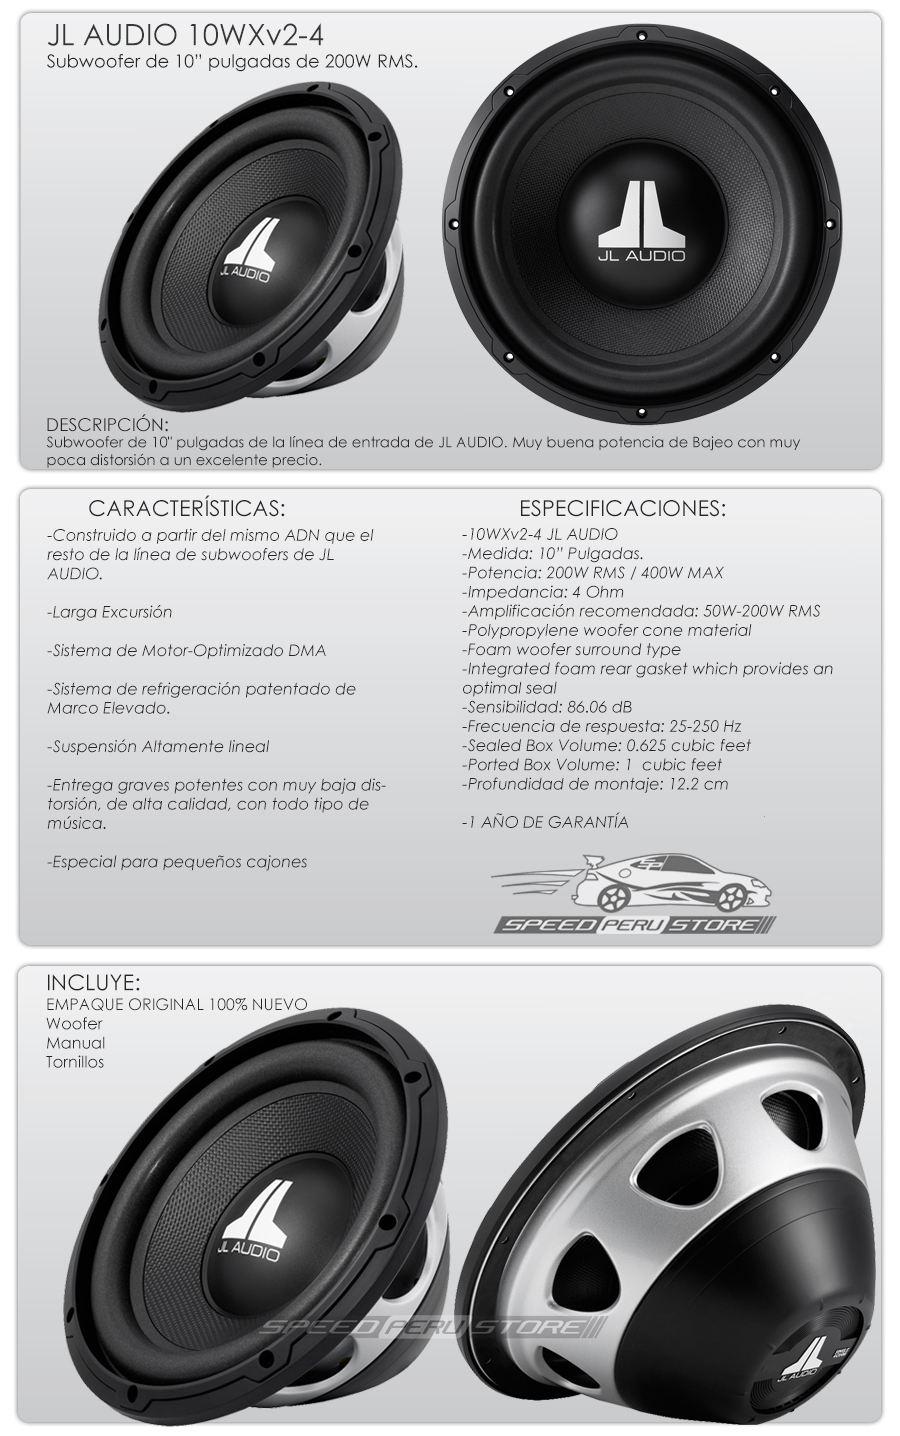 Subwoofer JL Audio 10WXV2-4